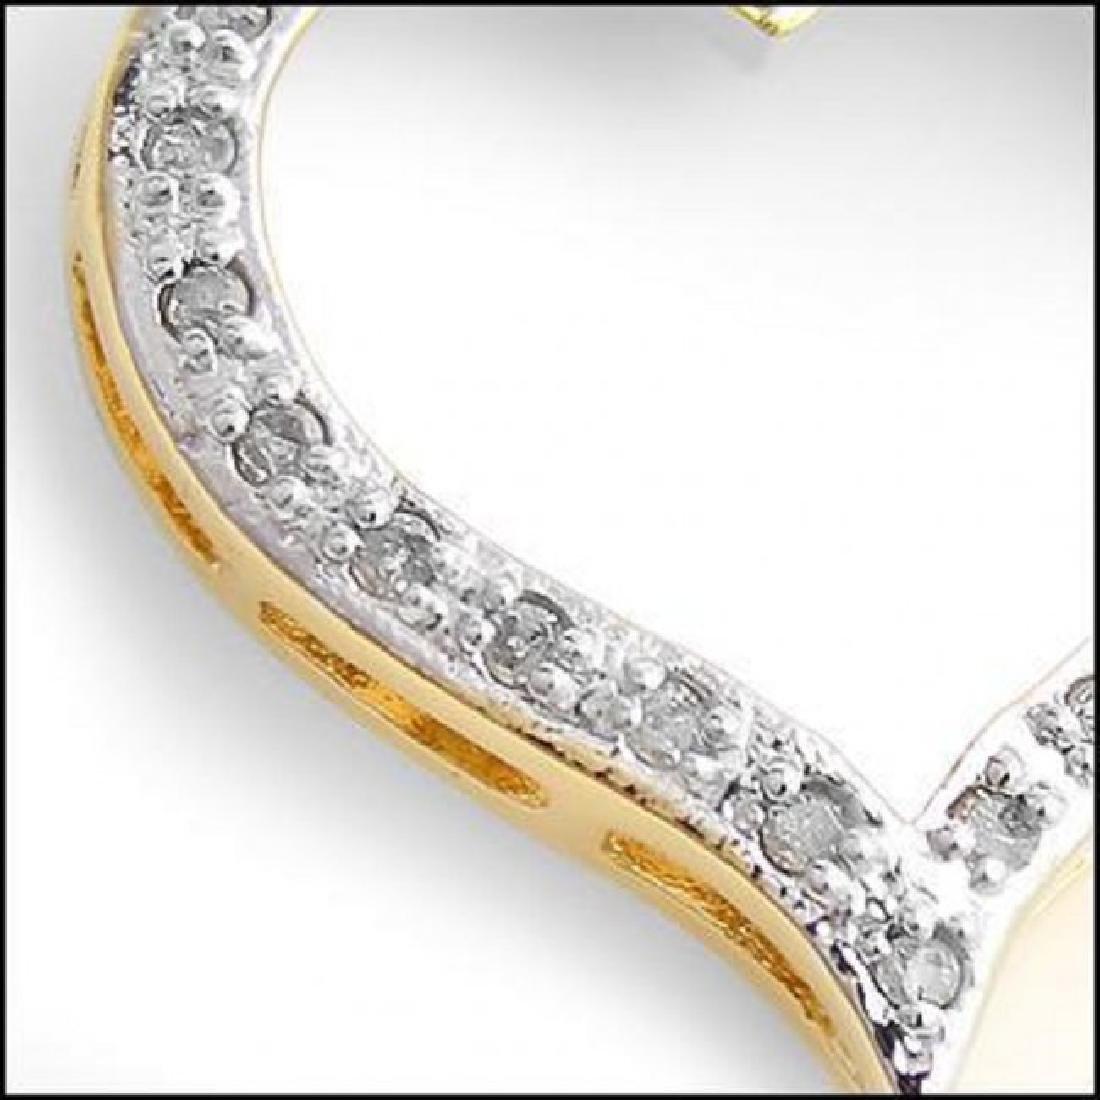 0.46 CT Diamond Heart Designer Necklace $775 - 2